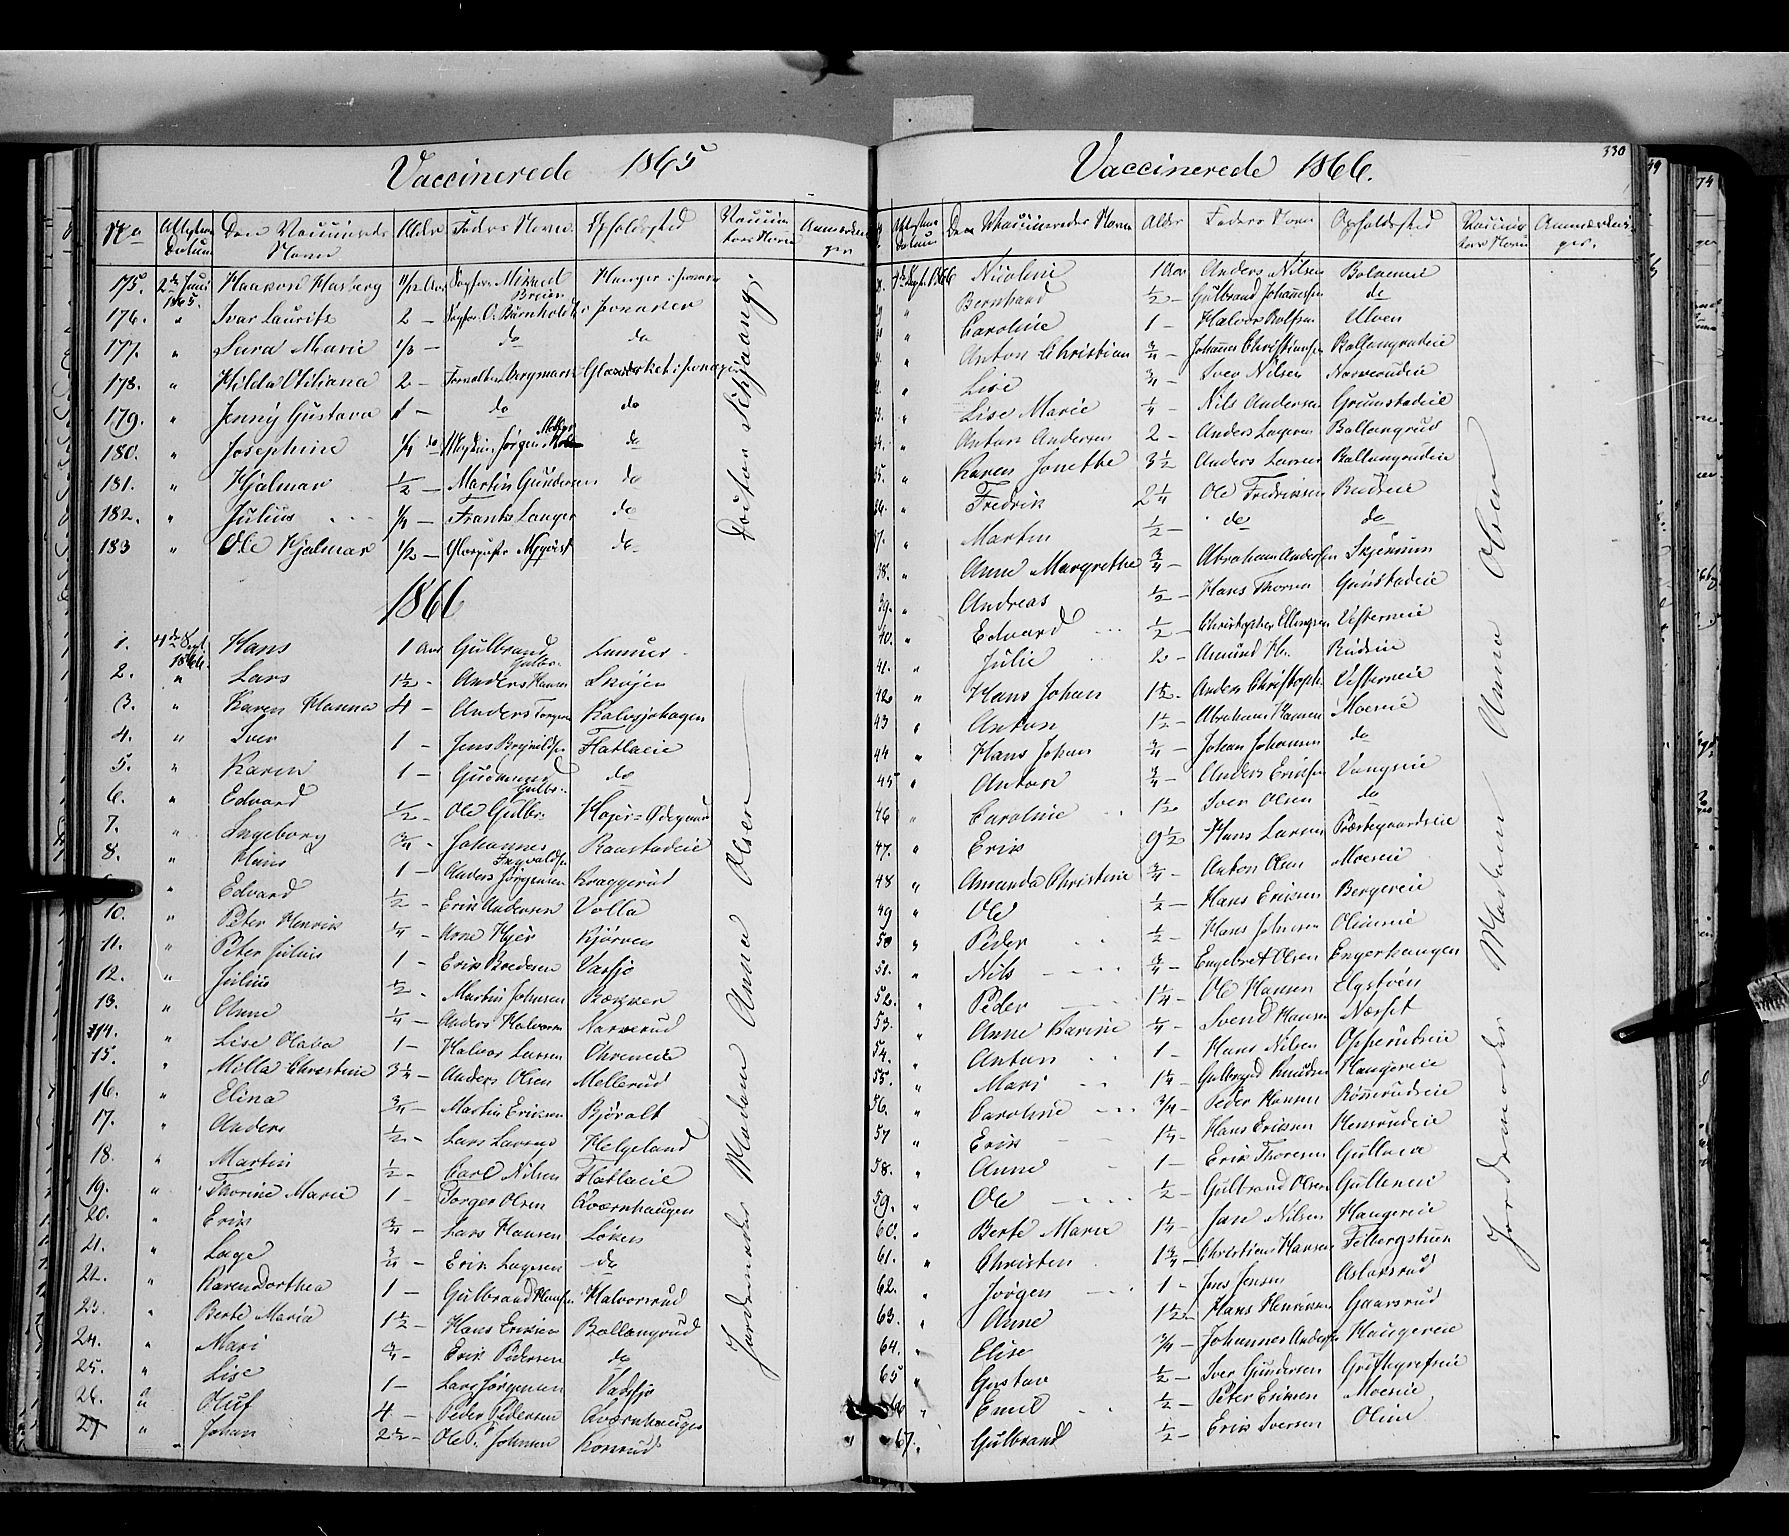 SAH, Jevnaker prestekontor, Ministerialbok nr. 7, 1858-1876, s. 330